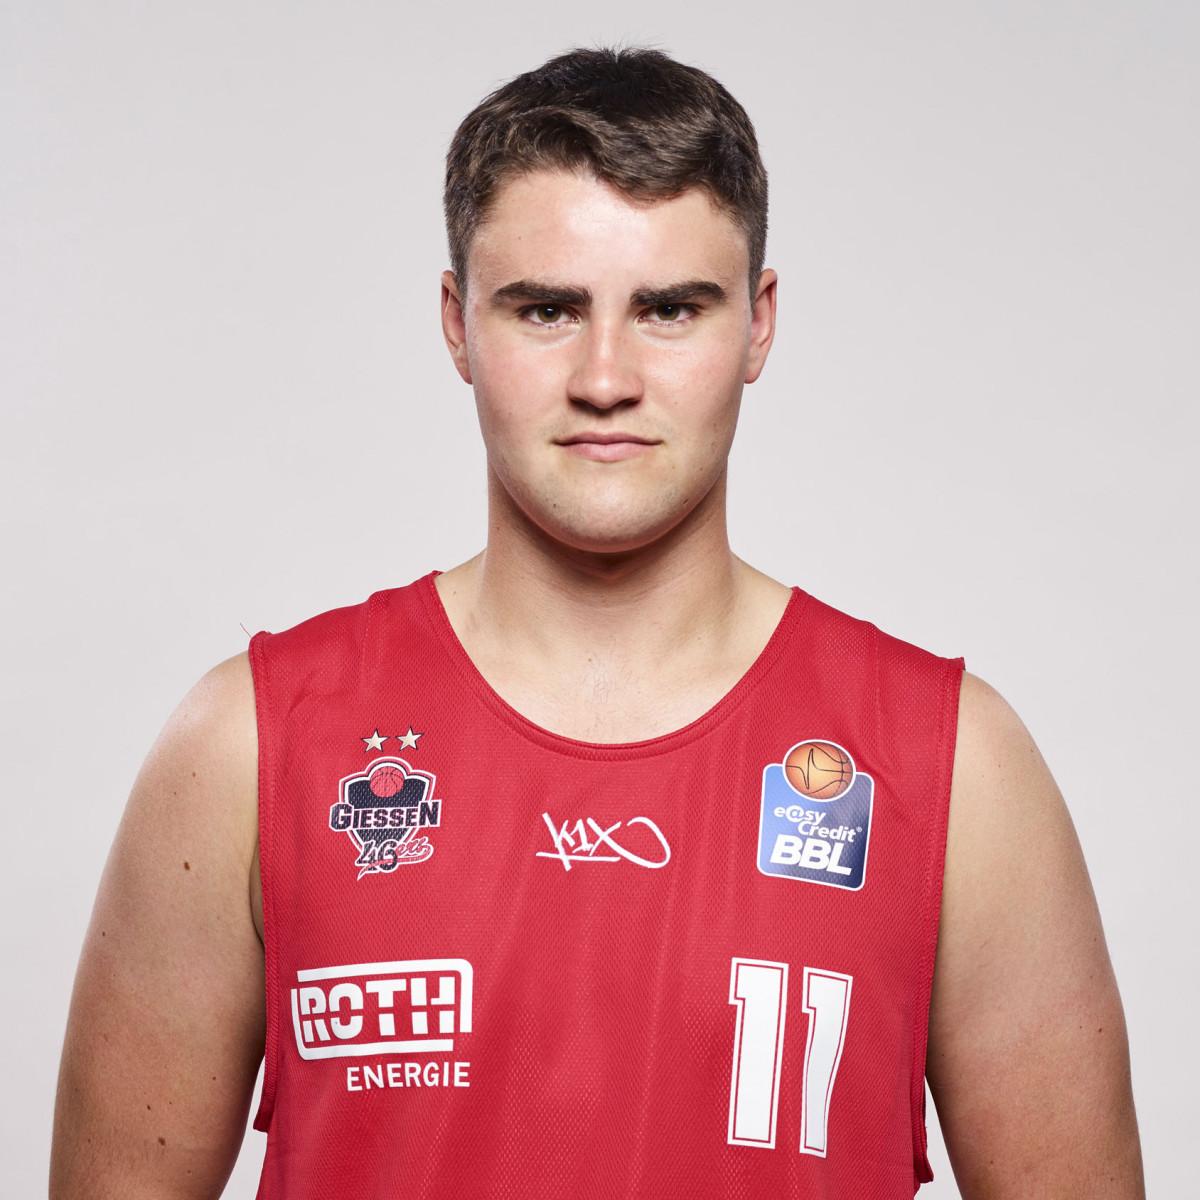 Photo of Tim Uhlemann, 2018-2019 season